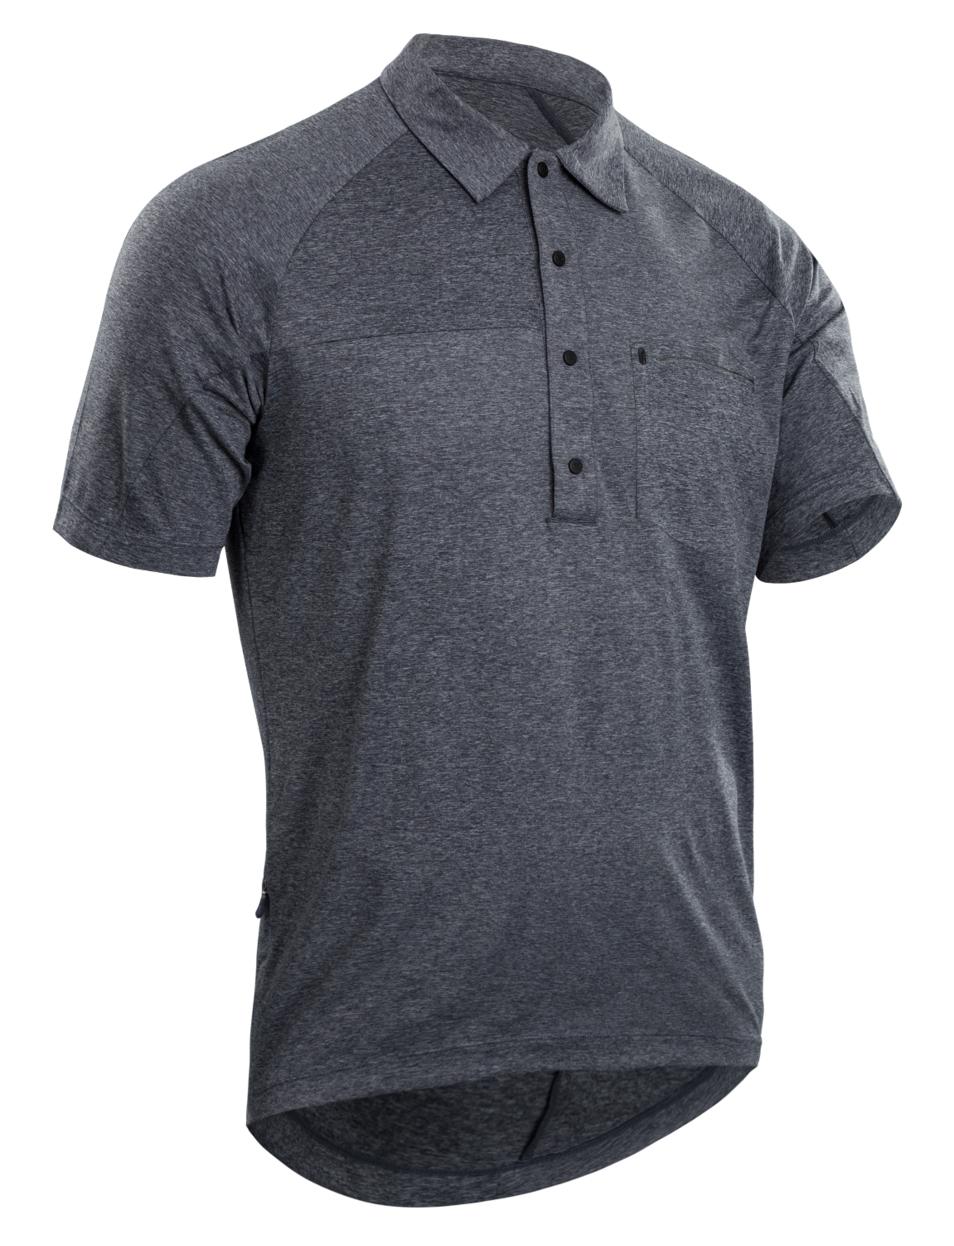 Sugoi Coast S/S Men's Polo Shirt